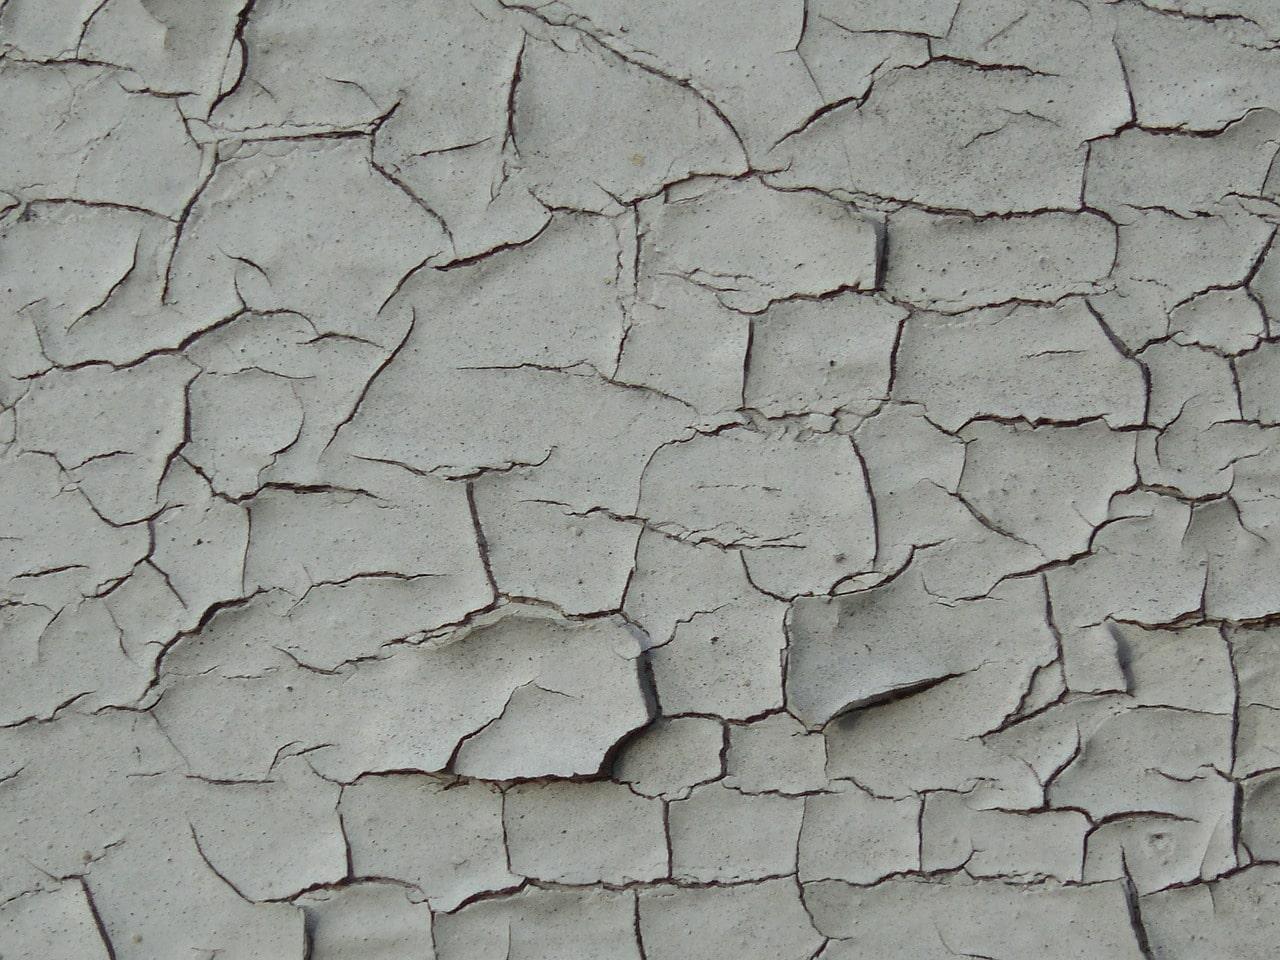 cracked lead paint